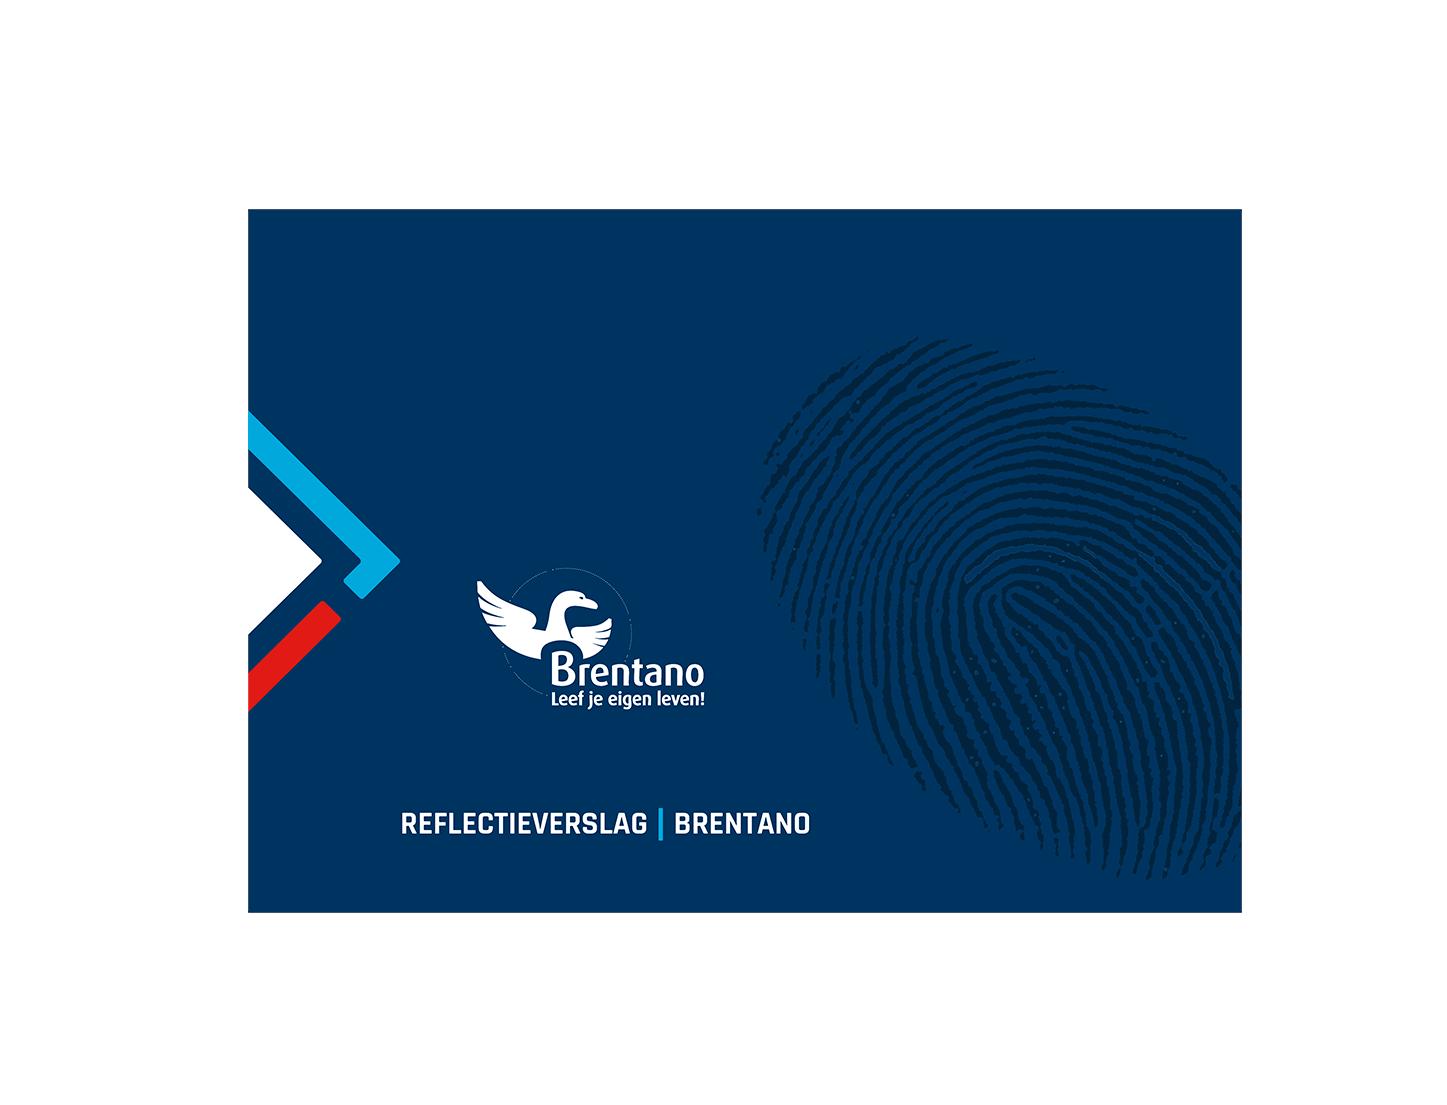 Reflectie Stichting Brentano Amstelveen | Zorg | Romeo Delta